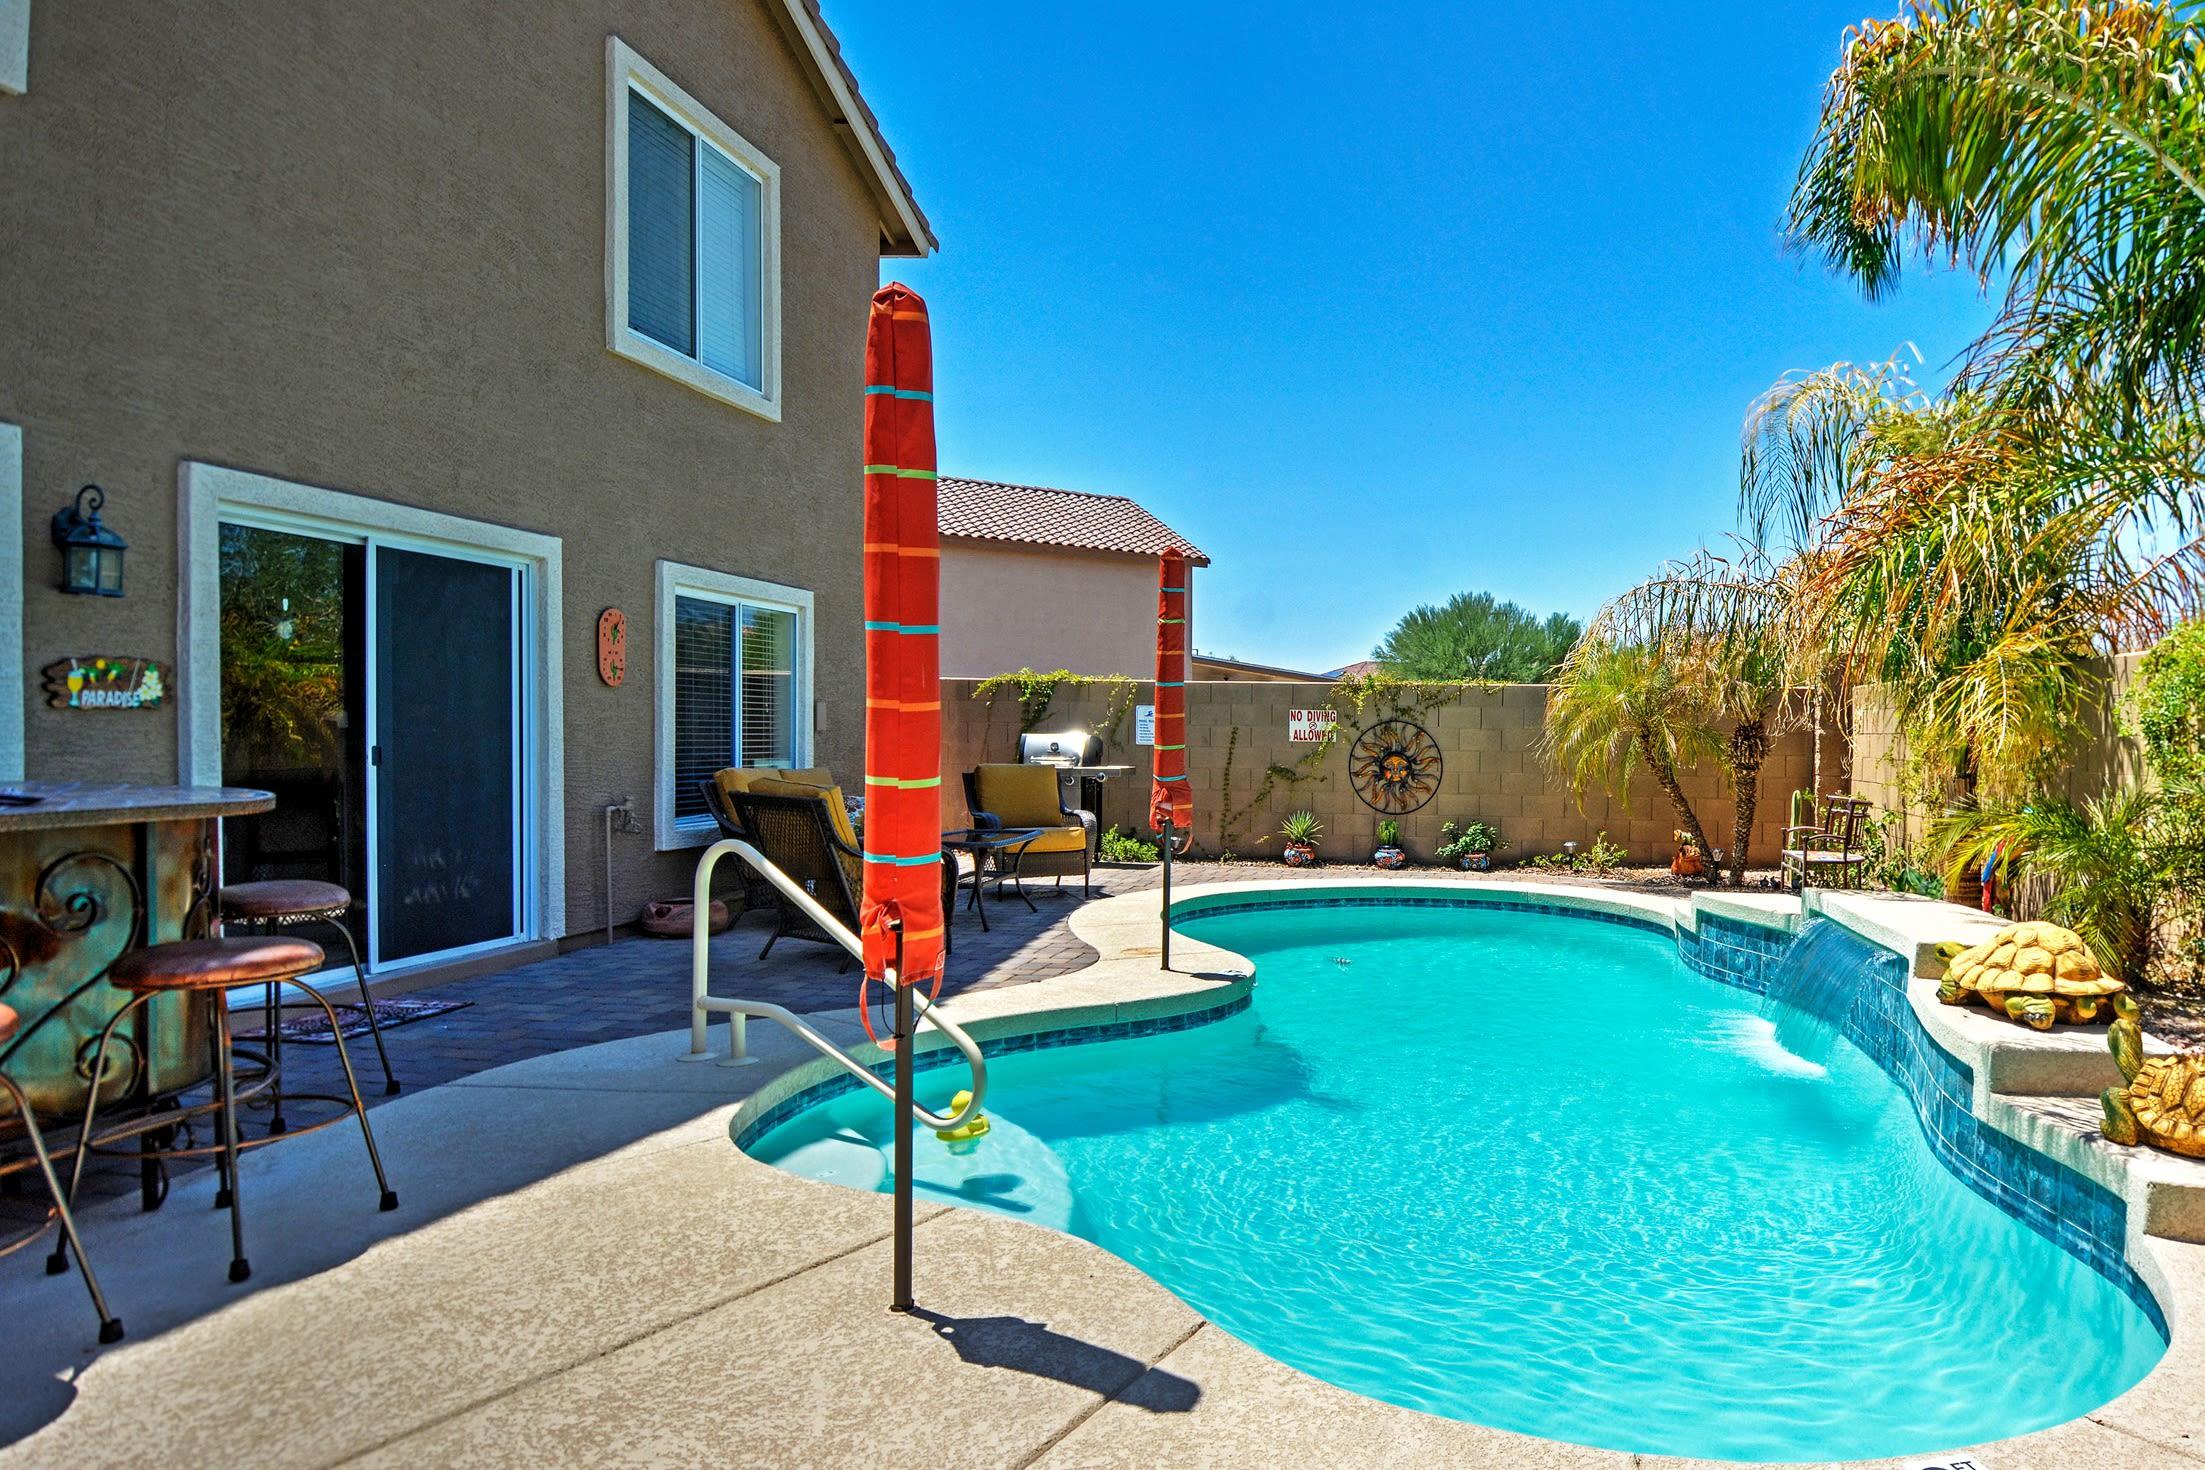 Enjoy a sunny getaway at this elegant Buckeye vacation rental home.